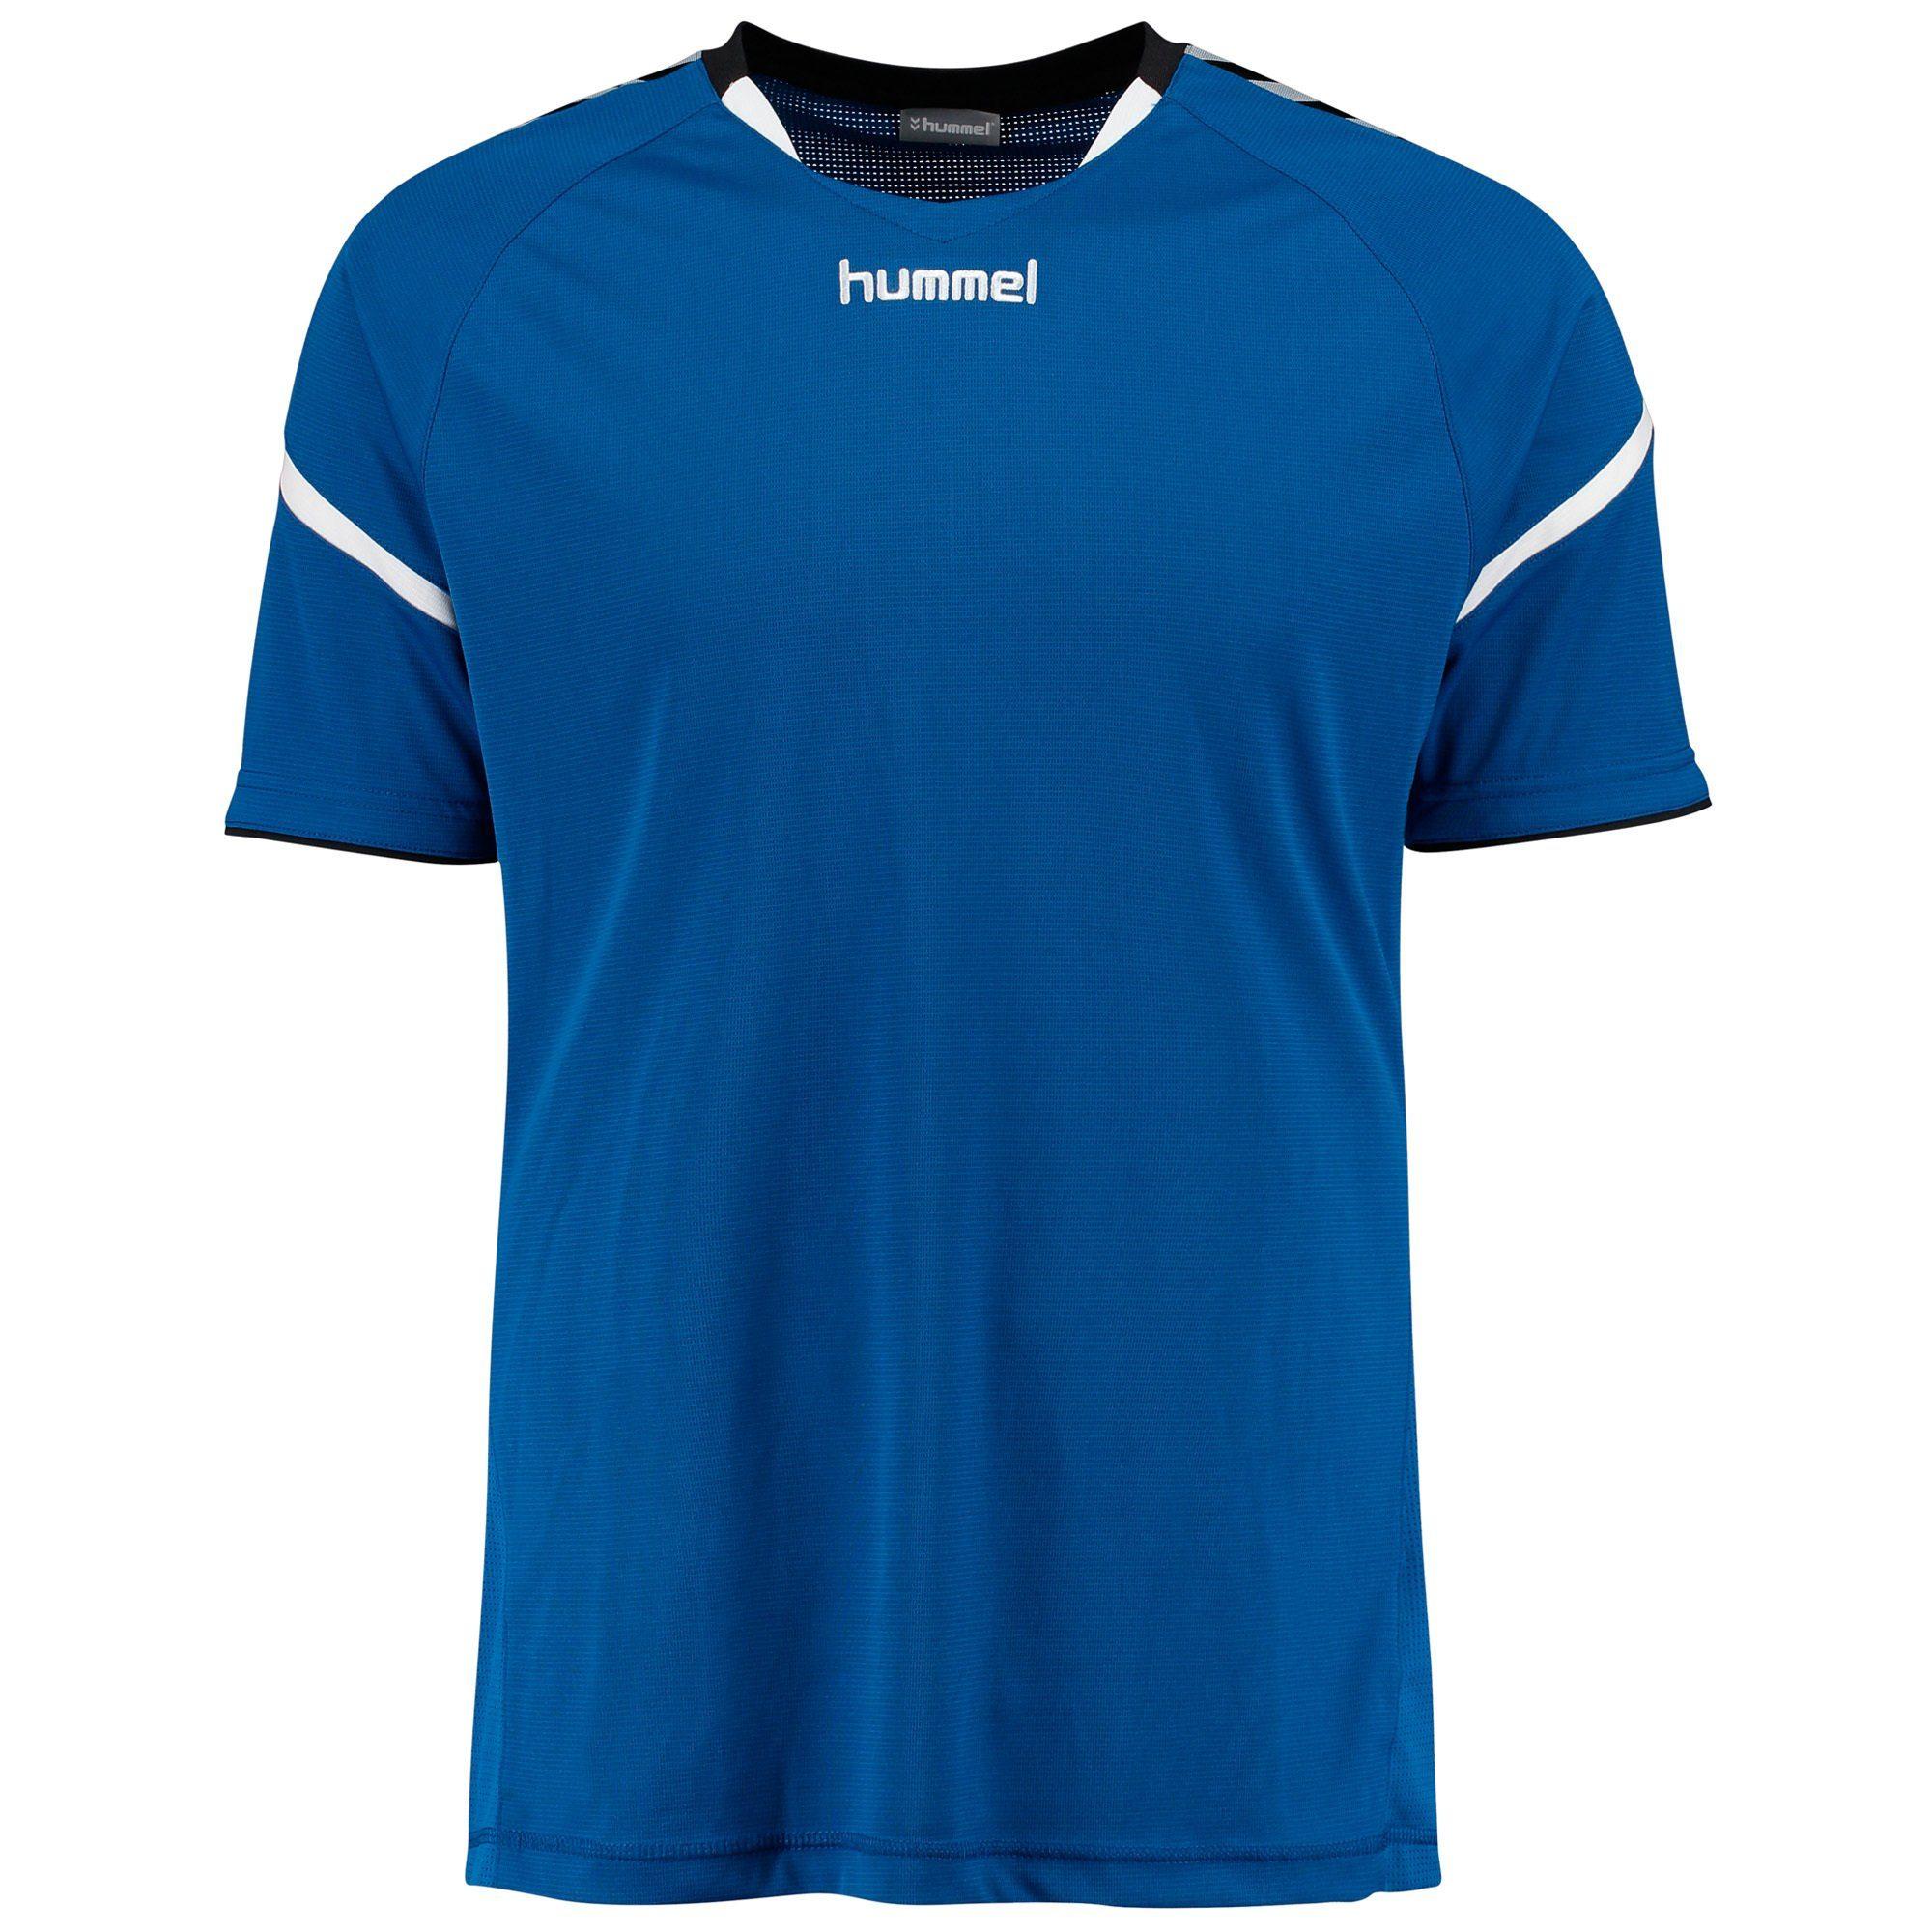 hummel Handballtrikot Authentic Charge | Sportbekleidung > Trikots > Handballtrikots | Blau | Jersey - Trikot | Hummel